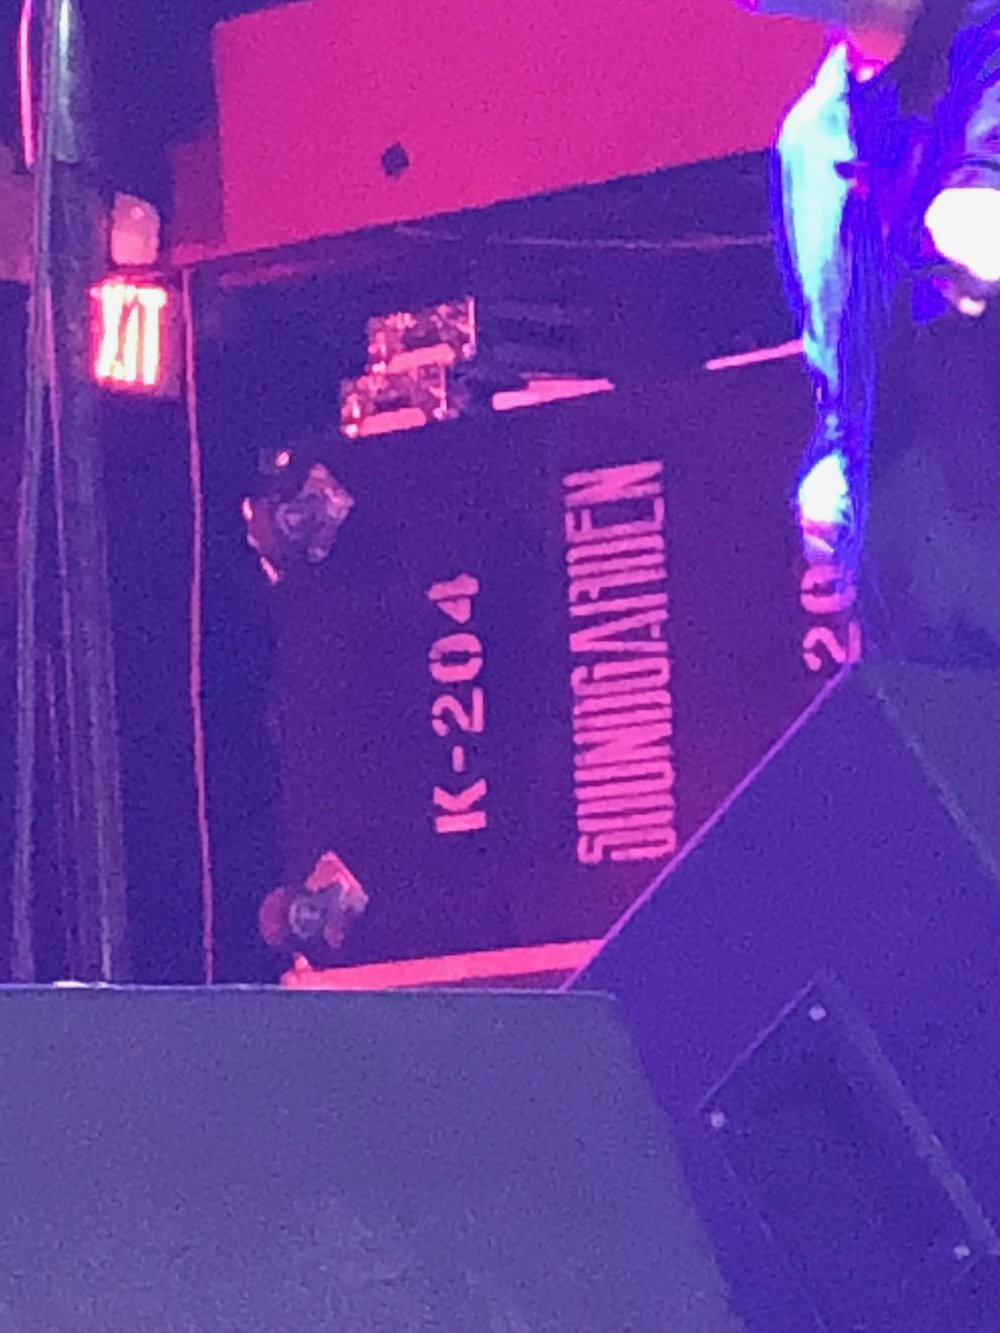 JeffgardenDotCom Kim Thayil MC50 FL - 13.jpg